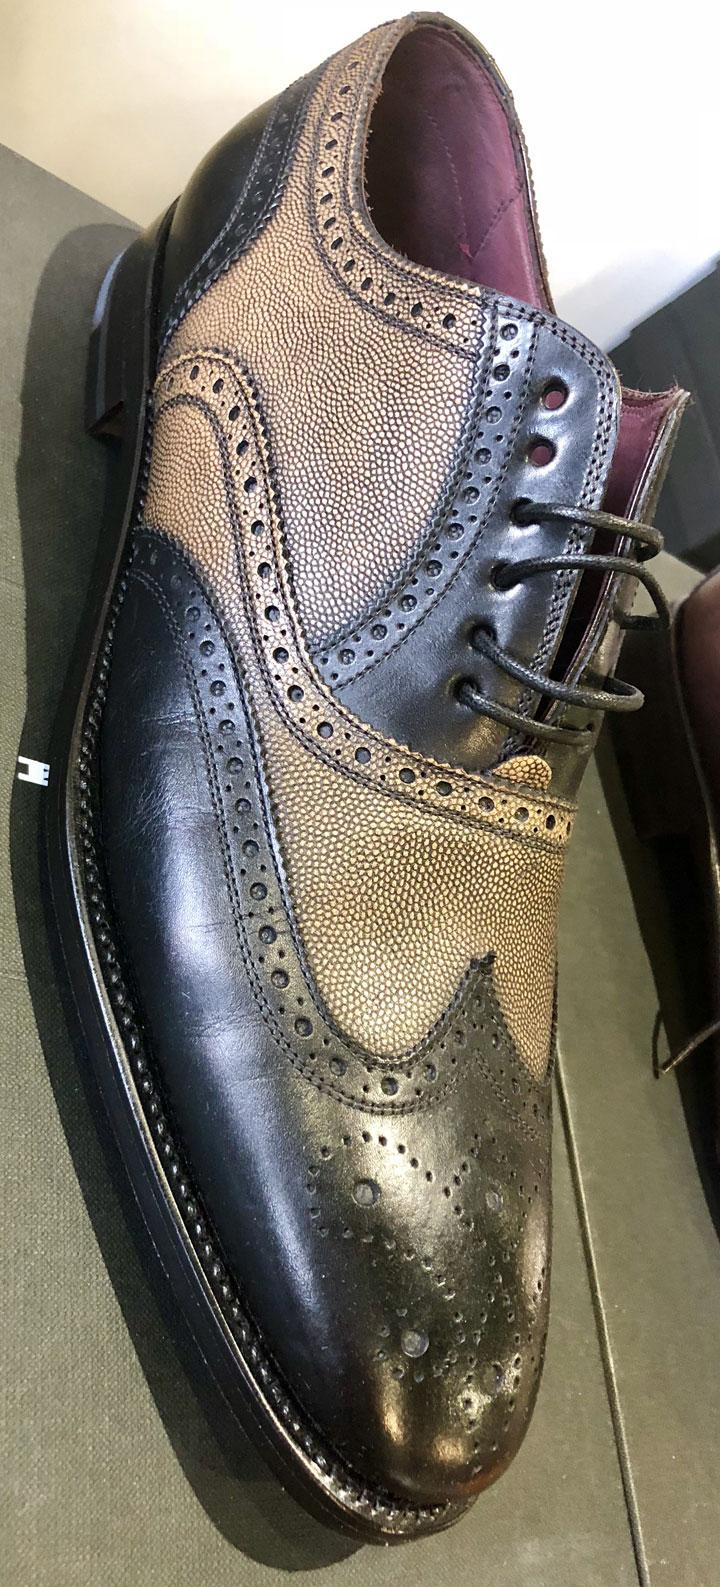 Kiton Sample Sale Dress Shoe